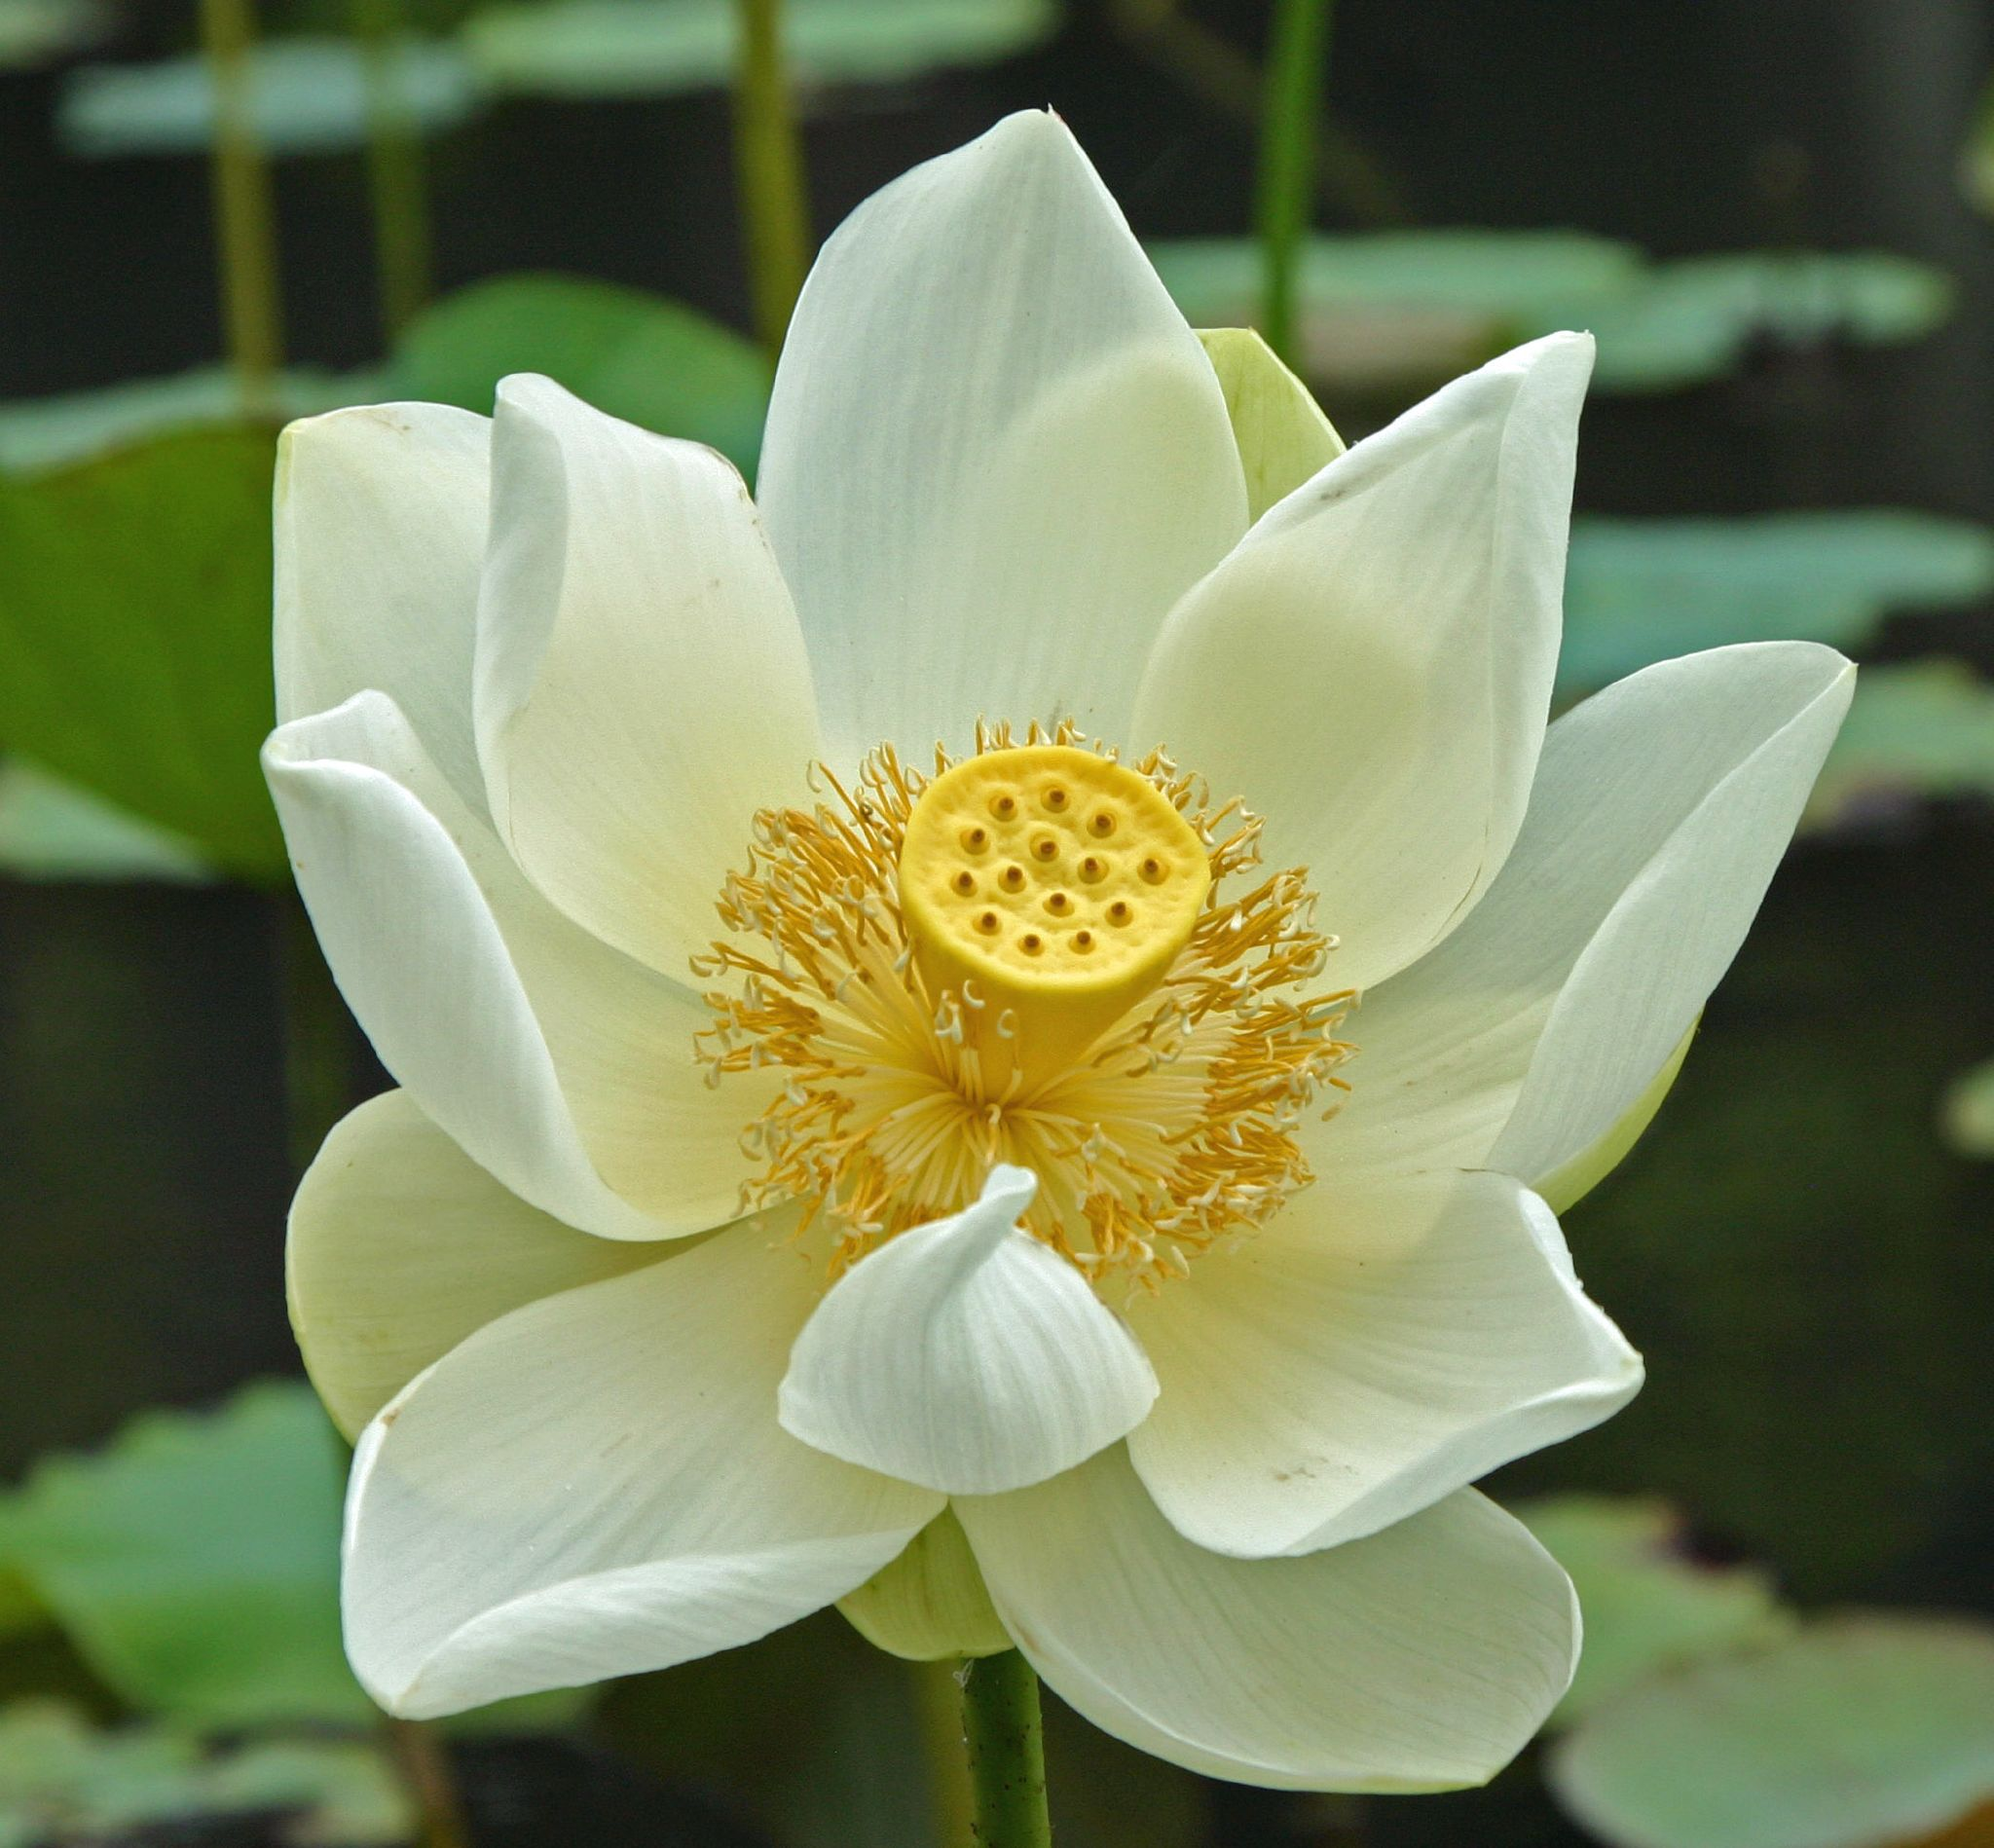 White_lotus,_Mauritius.jpg